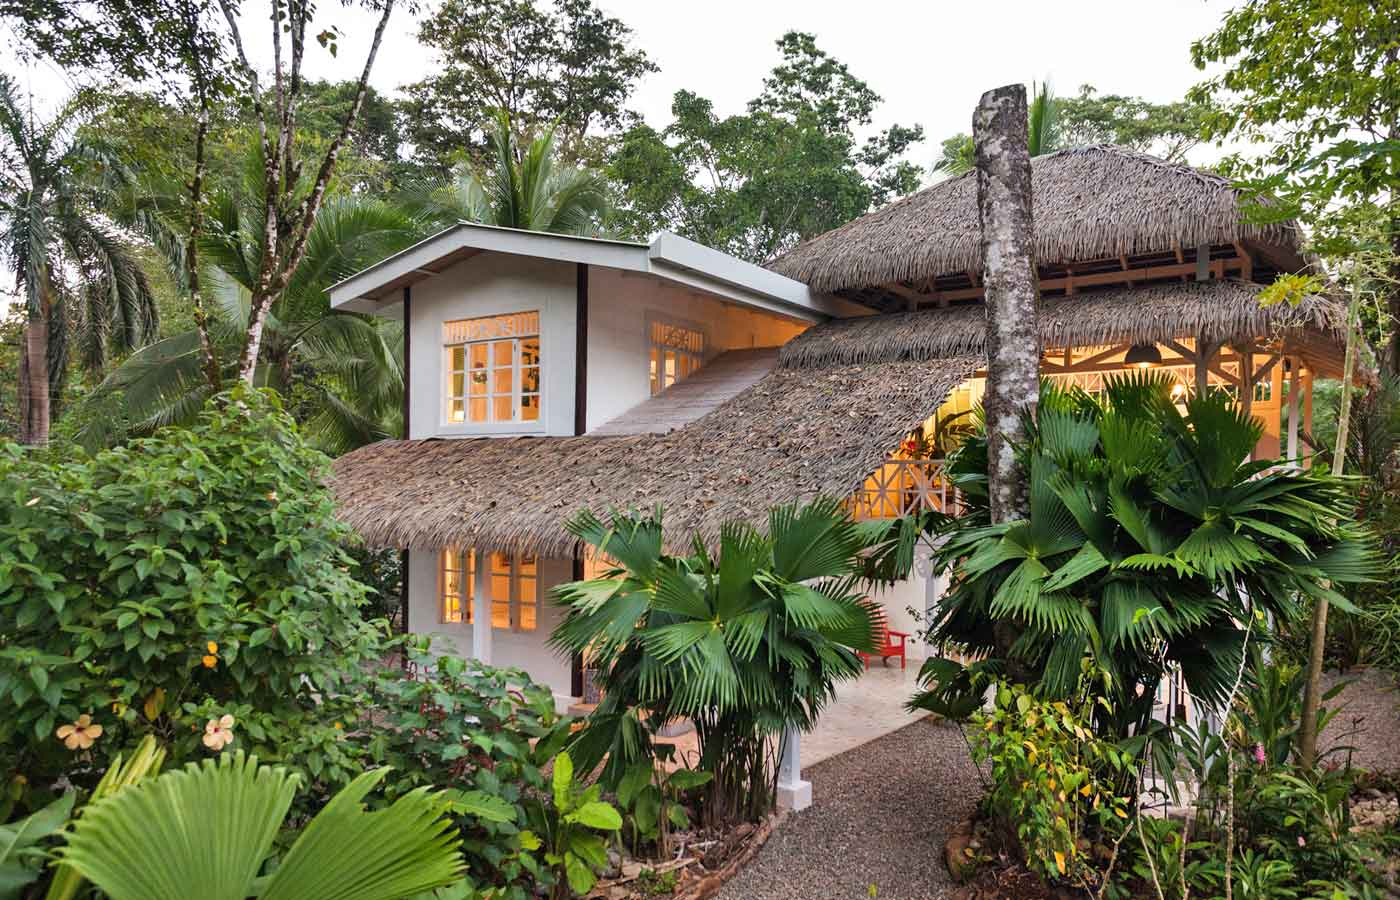 Hotel Aguas Claras, Puerto Viejo, Costa Rica